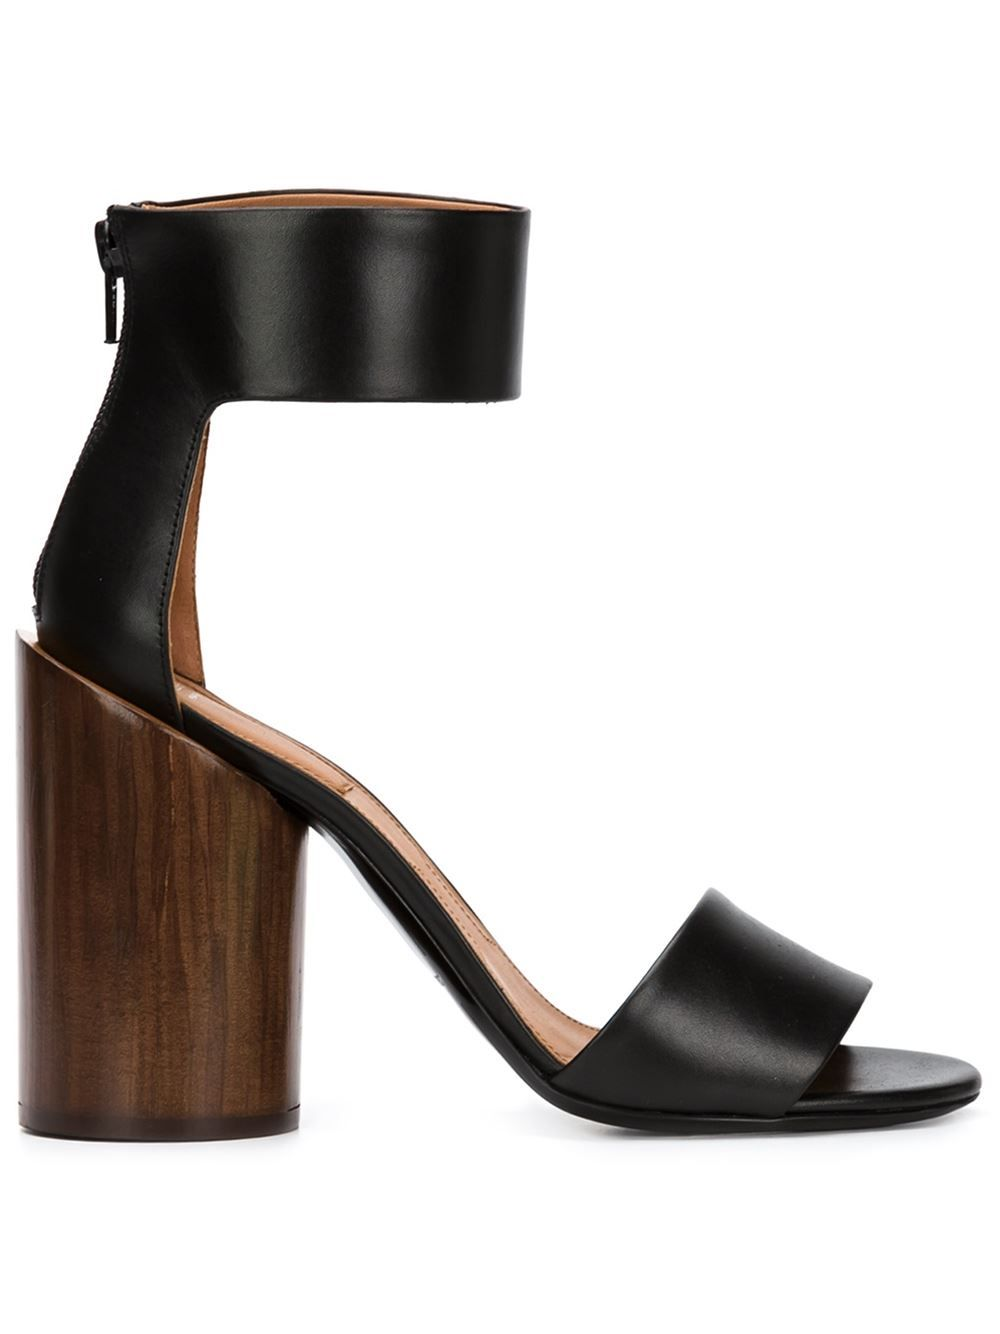 04f9dfc34 Givenchy туфли на массивном каблуке | SHOPAHOLIC | Сандалии, Каблуки ...